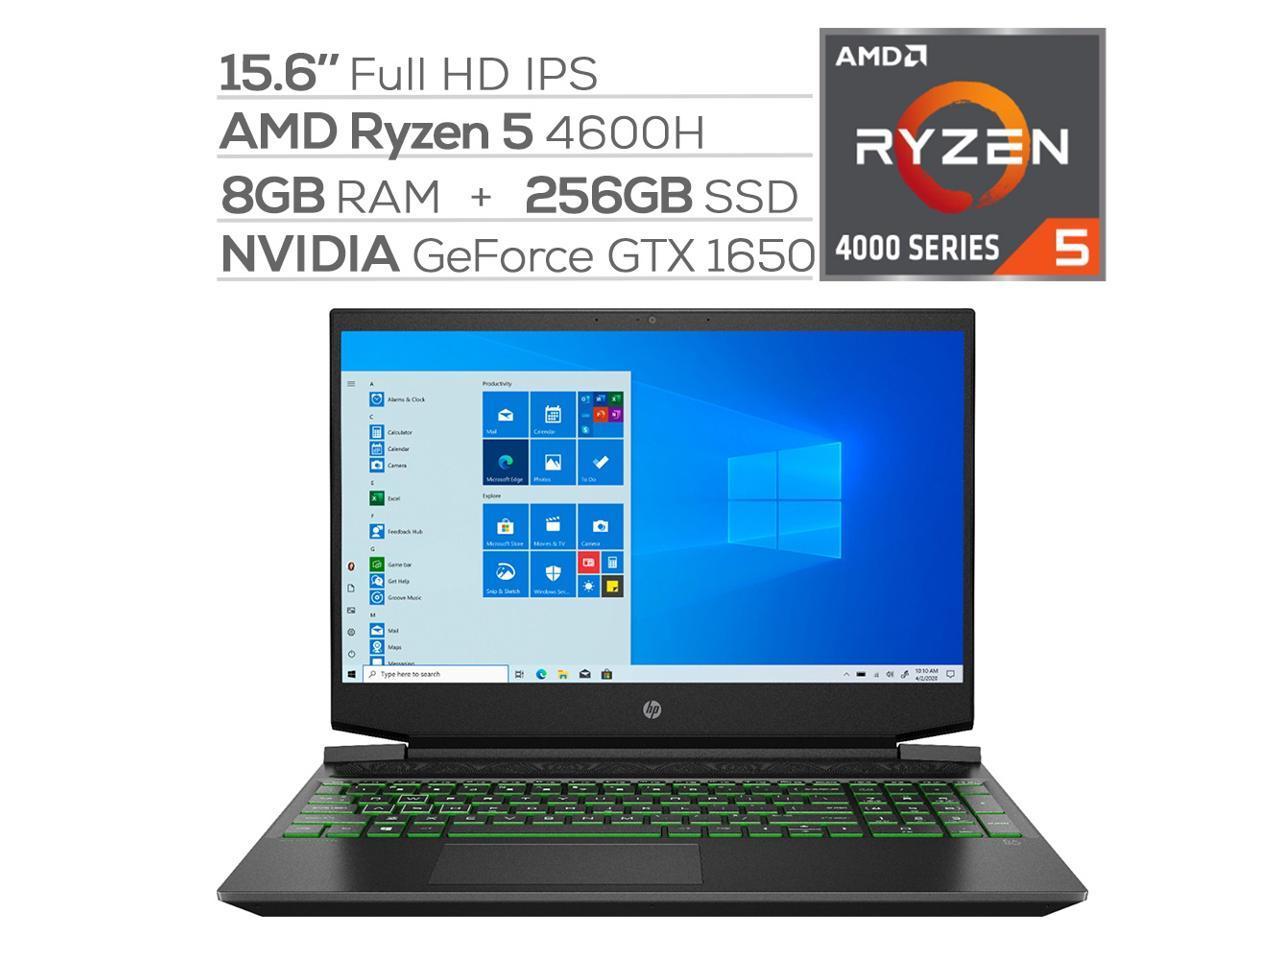 Hp Pavilion Gaming 15 Laptop Amd Ryzen 5 4600h 6 Core Up To 4 0 Ghz Gtx 1650 8gb Ram 256gb Pcie Nvme Ssd 15 6 Full Hd Backlit Kb Win 10 Newegg Com